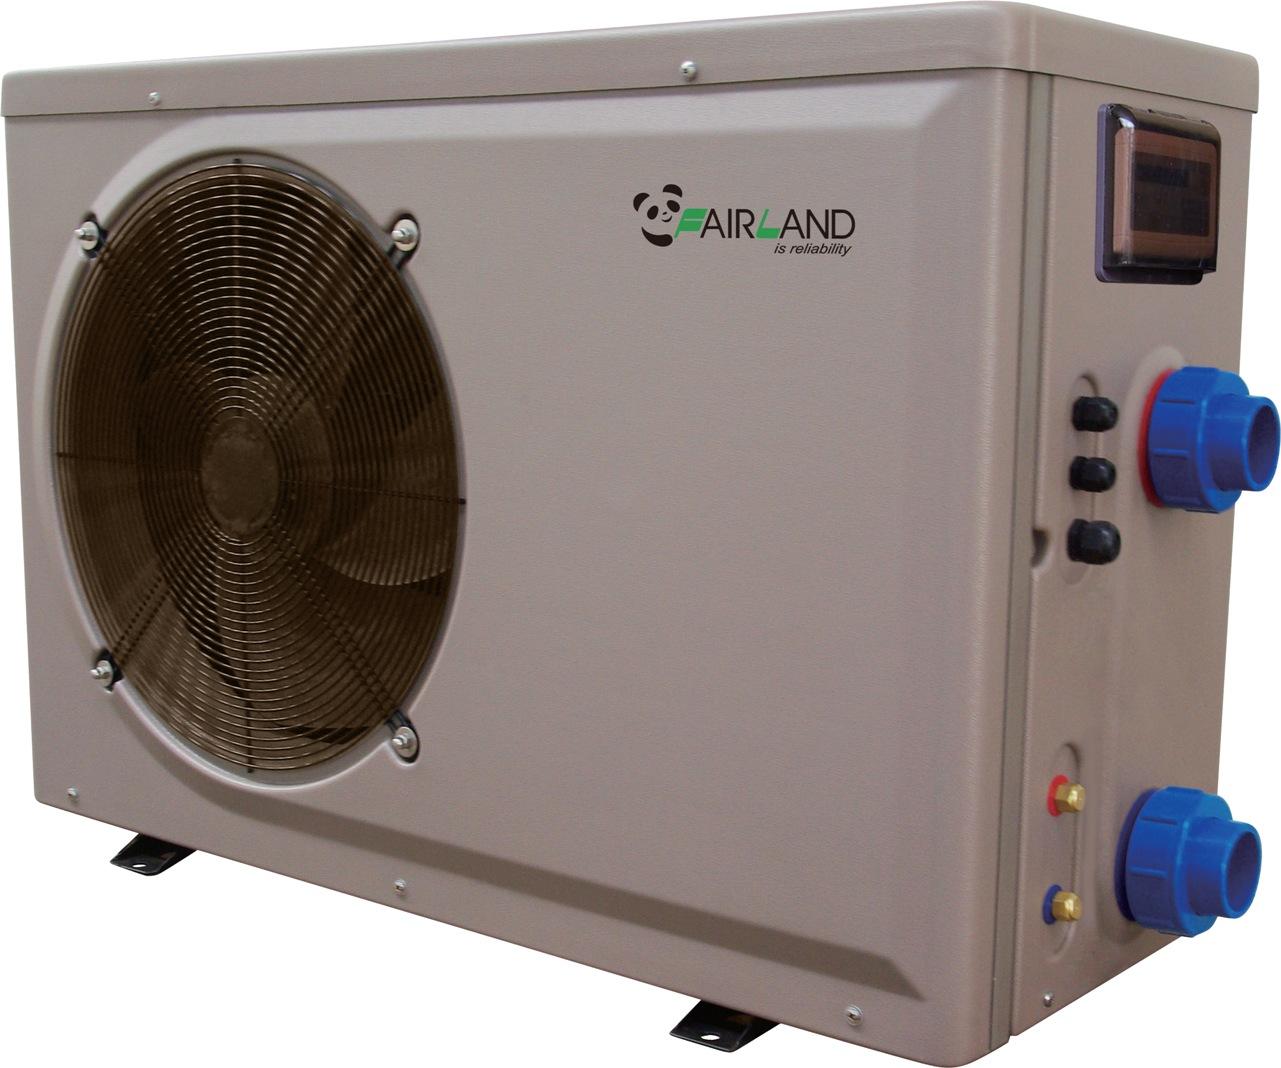 AKCE - FAIRLAND 13DOD TČ FAIRLAND PIONEER PH25L 10kW, R410a, 230V, titan výměník